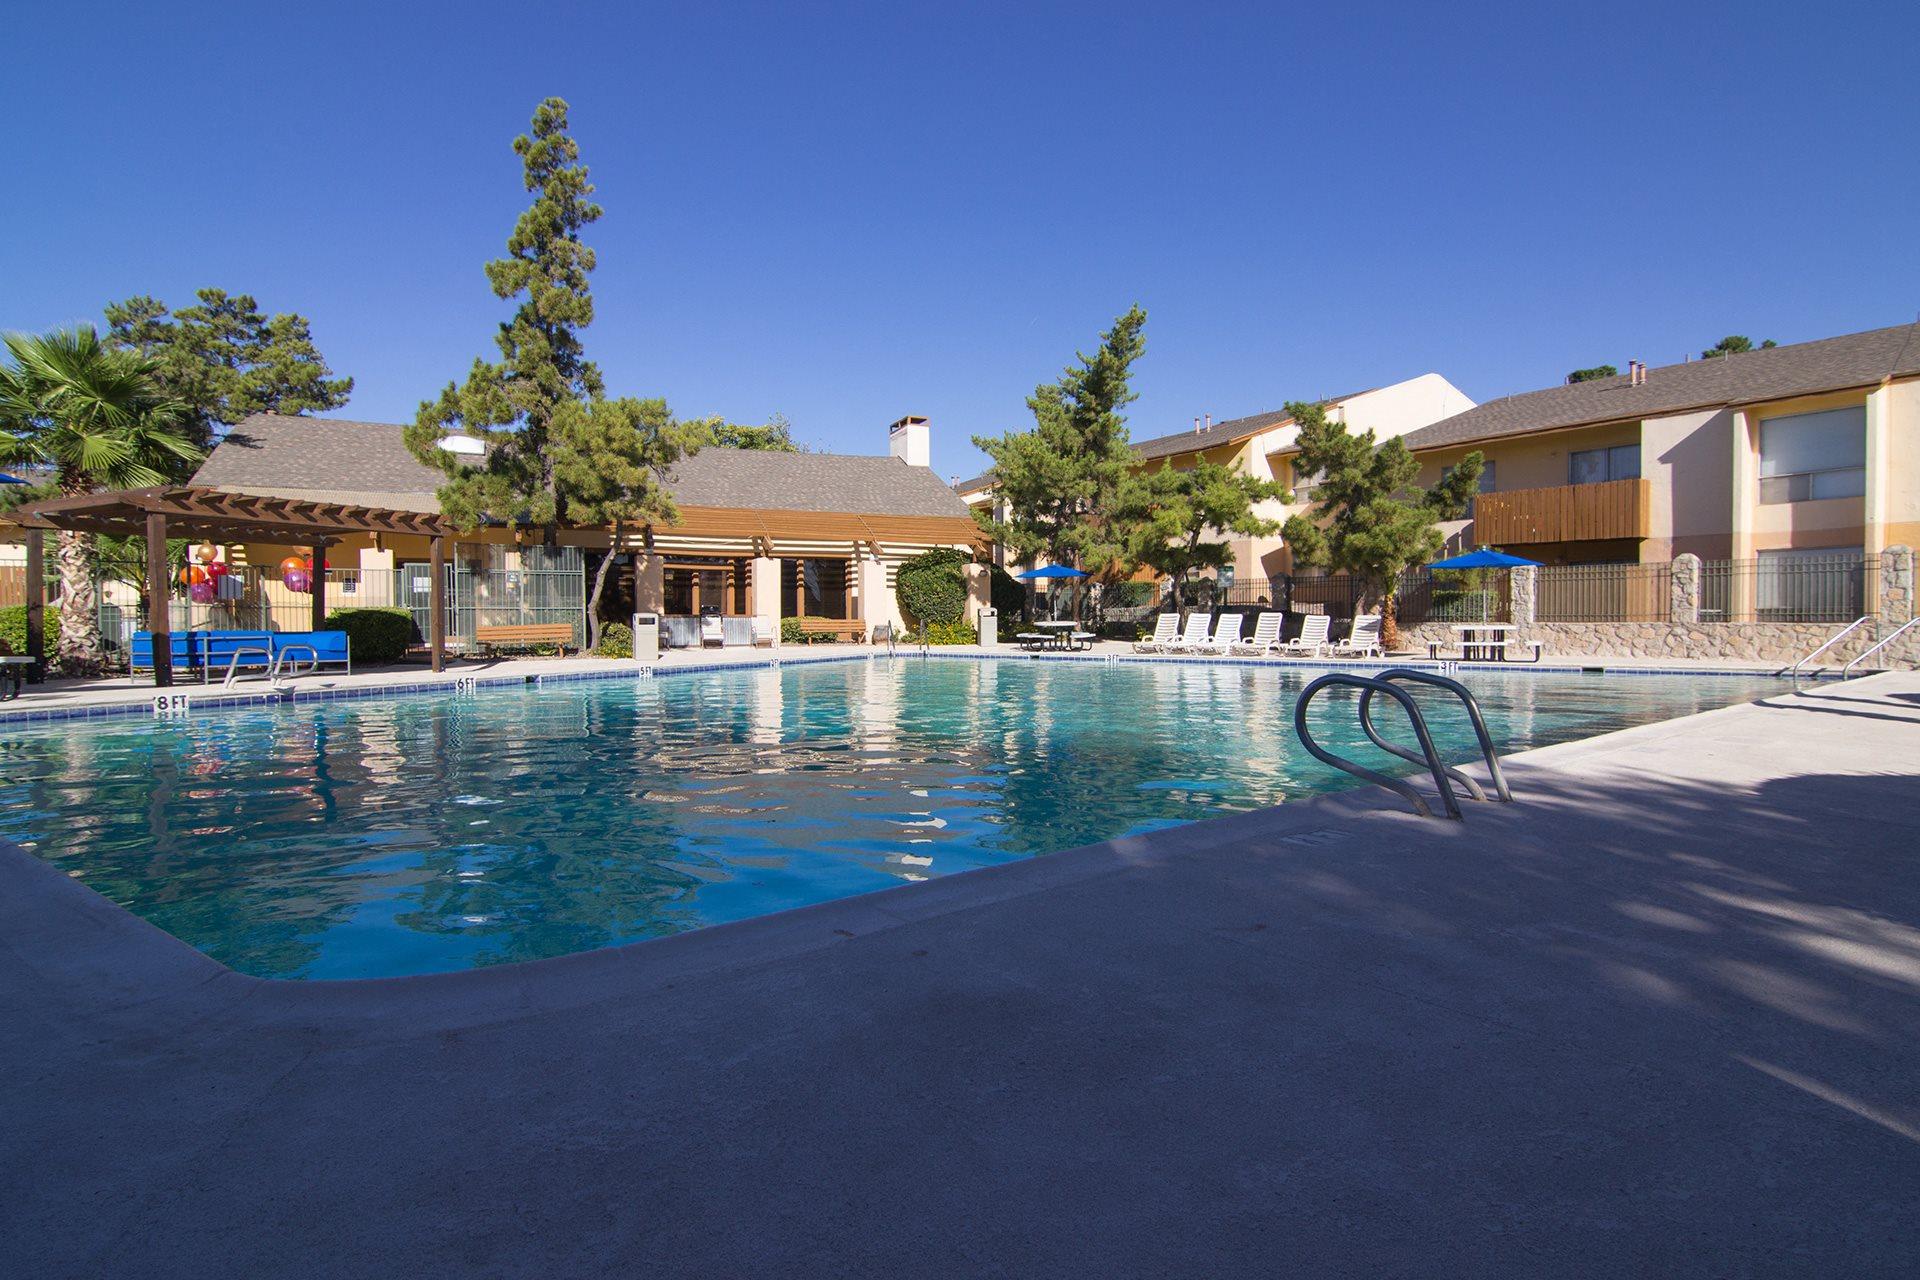 Pool, lounge chairs, apt building  El Paso, Texas 79935 l Ridgemar Texas Rentals